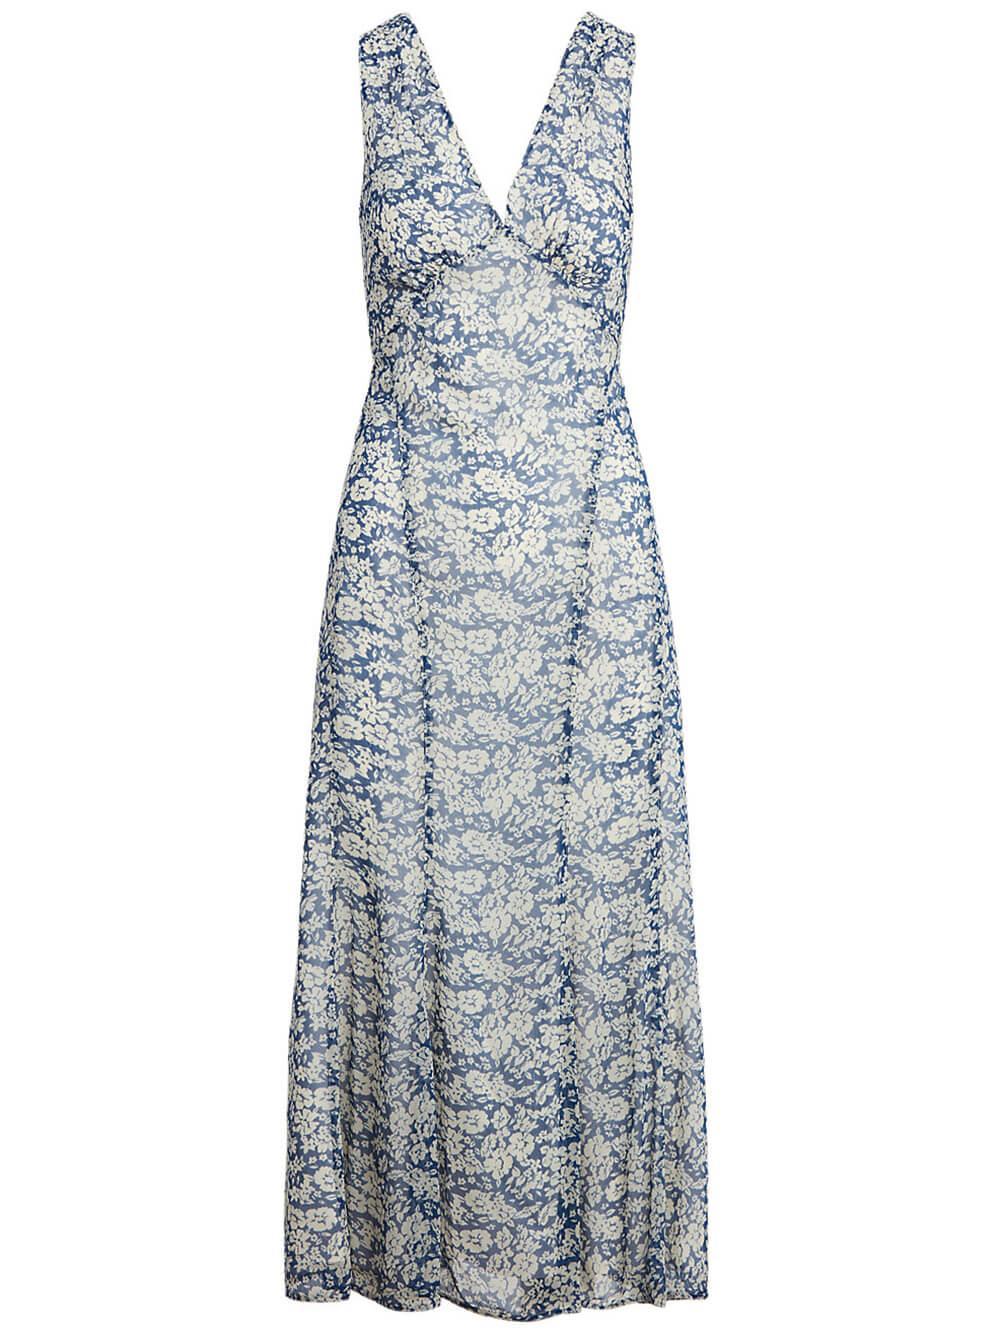 Floral Print Casual Dress